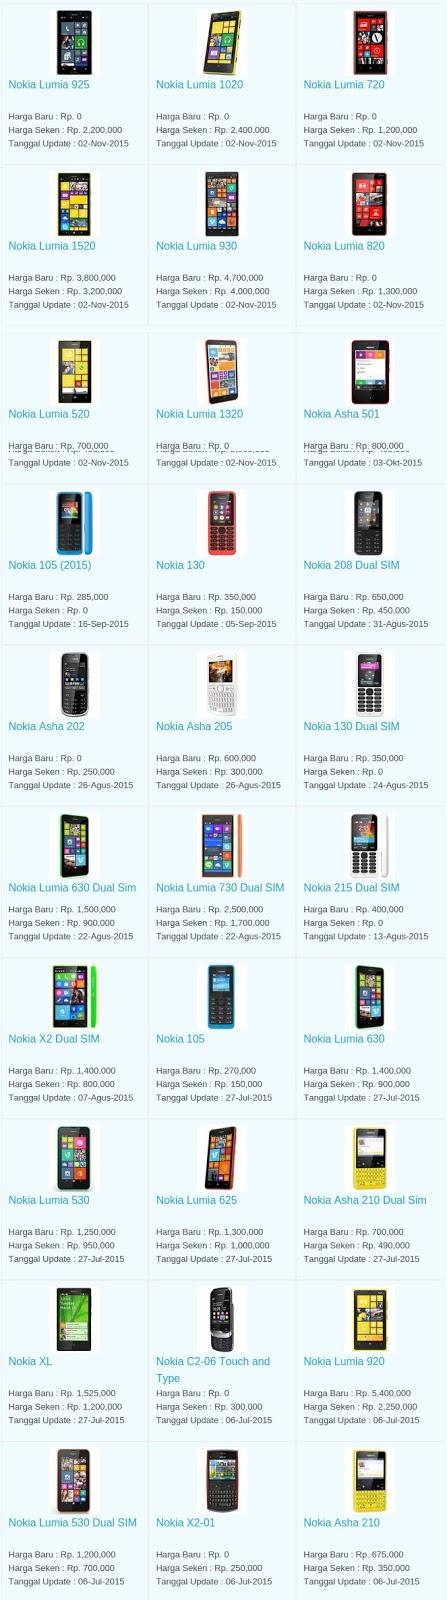 Daftar Harga Hp Nokia Januari 2016